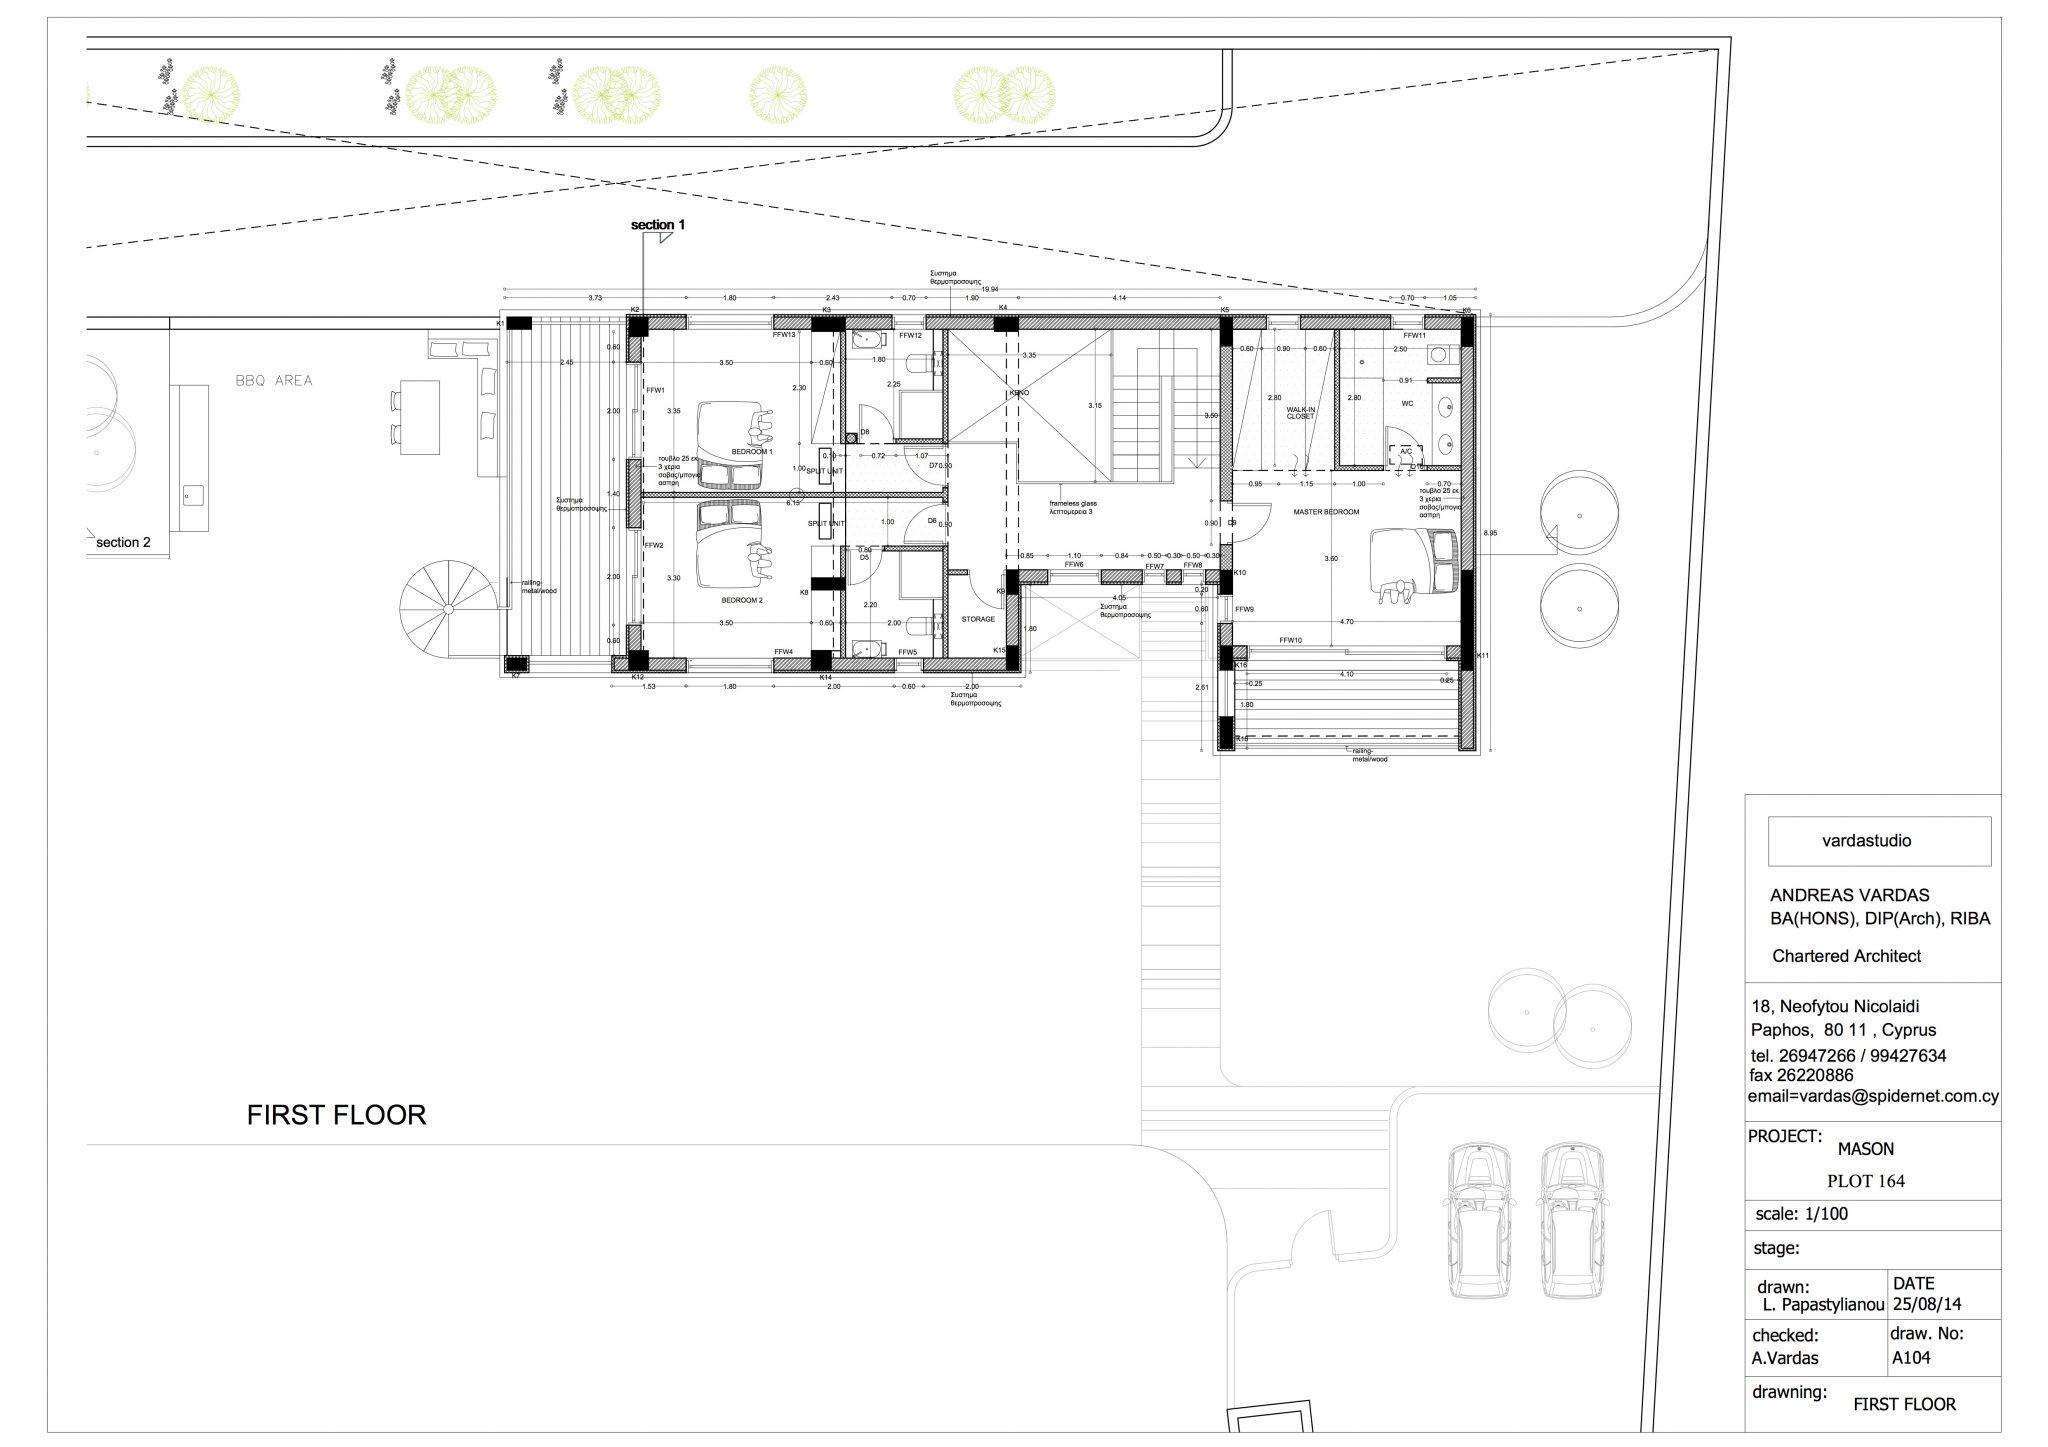 1538 - 5 Bedroom Villa - Aphrodite Hills floorplan